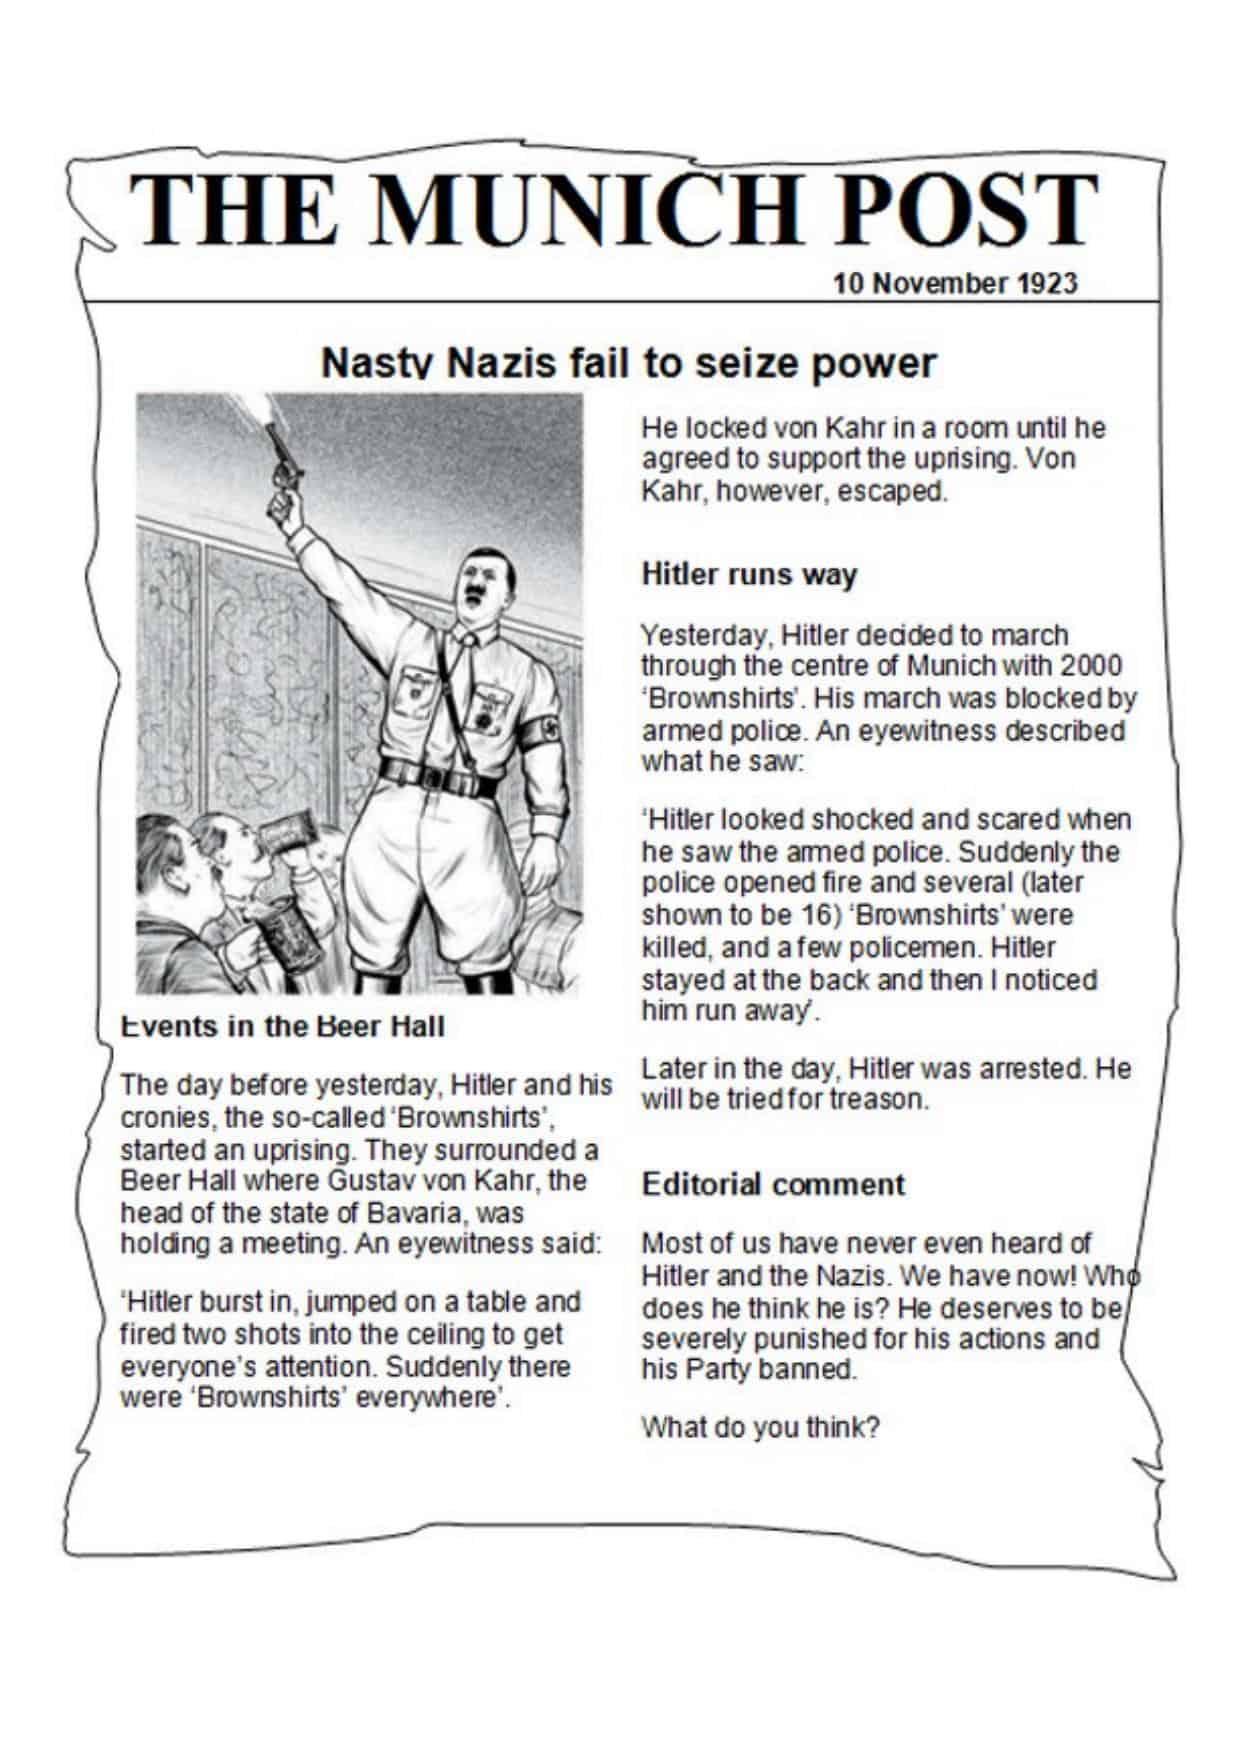 Munich Putsch Newspaper Article History Resources